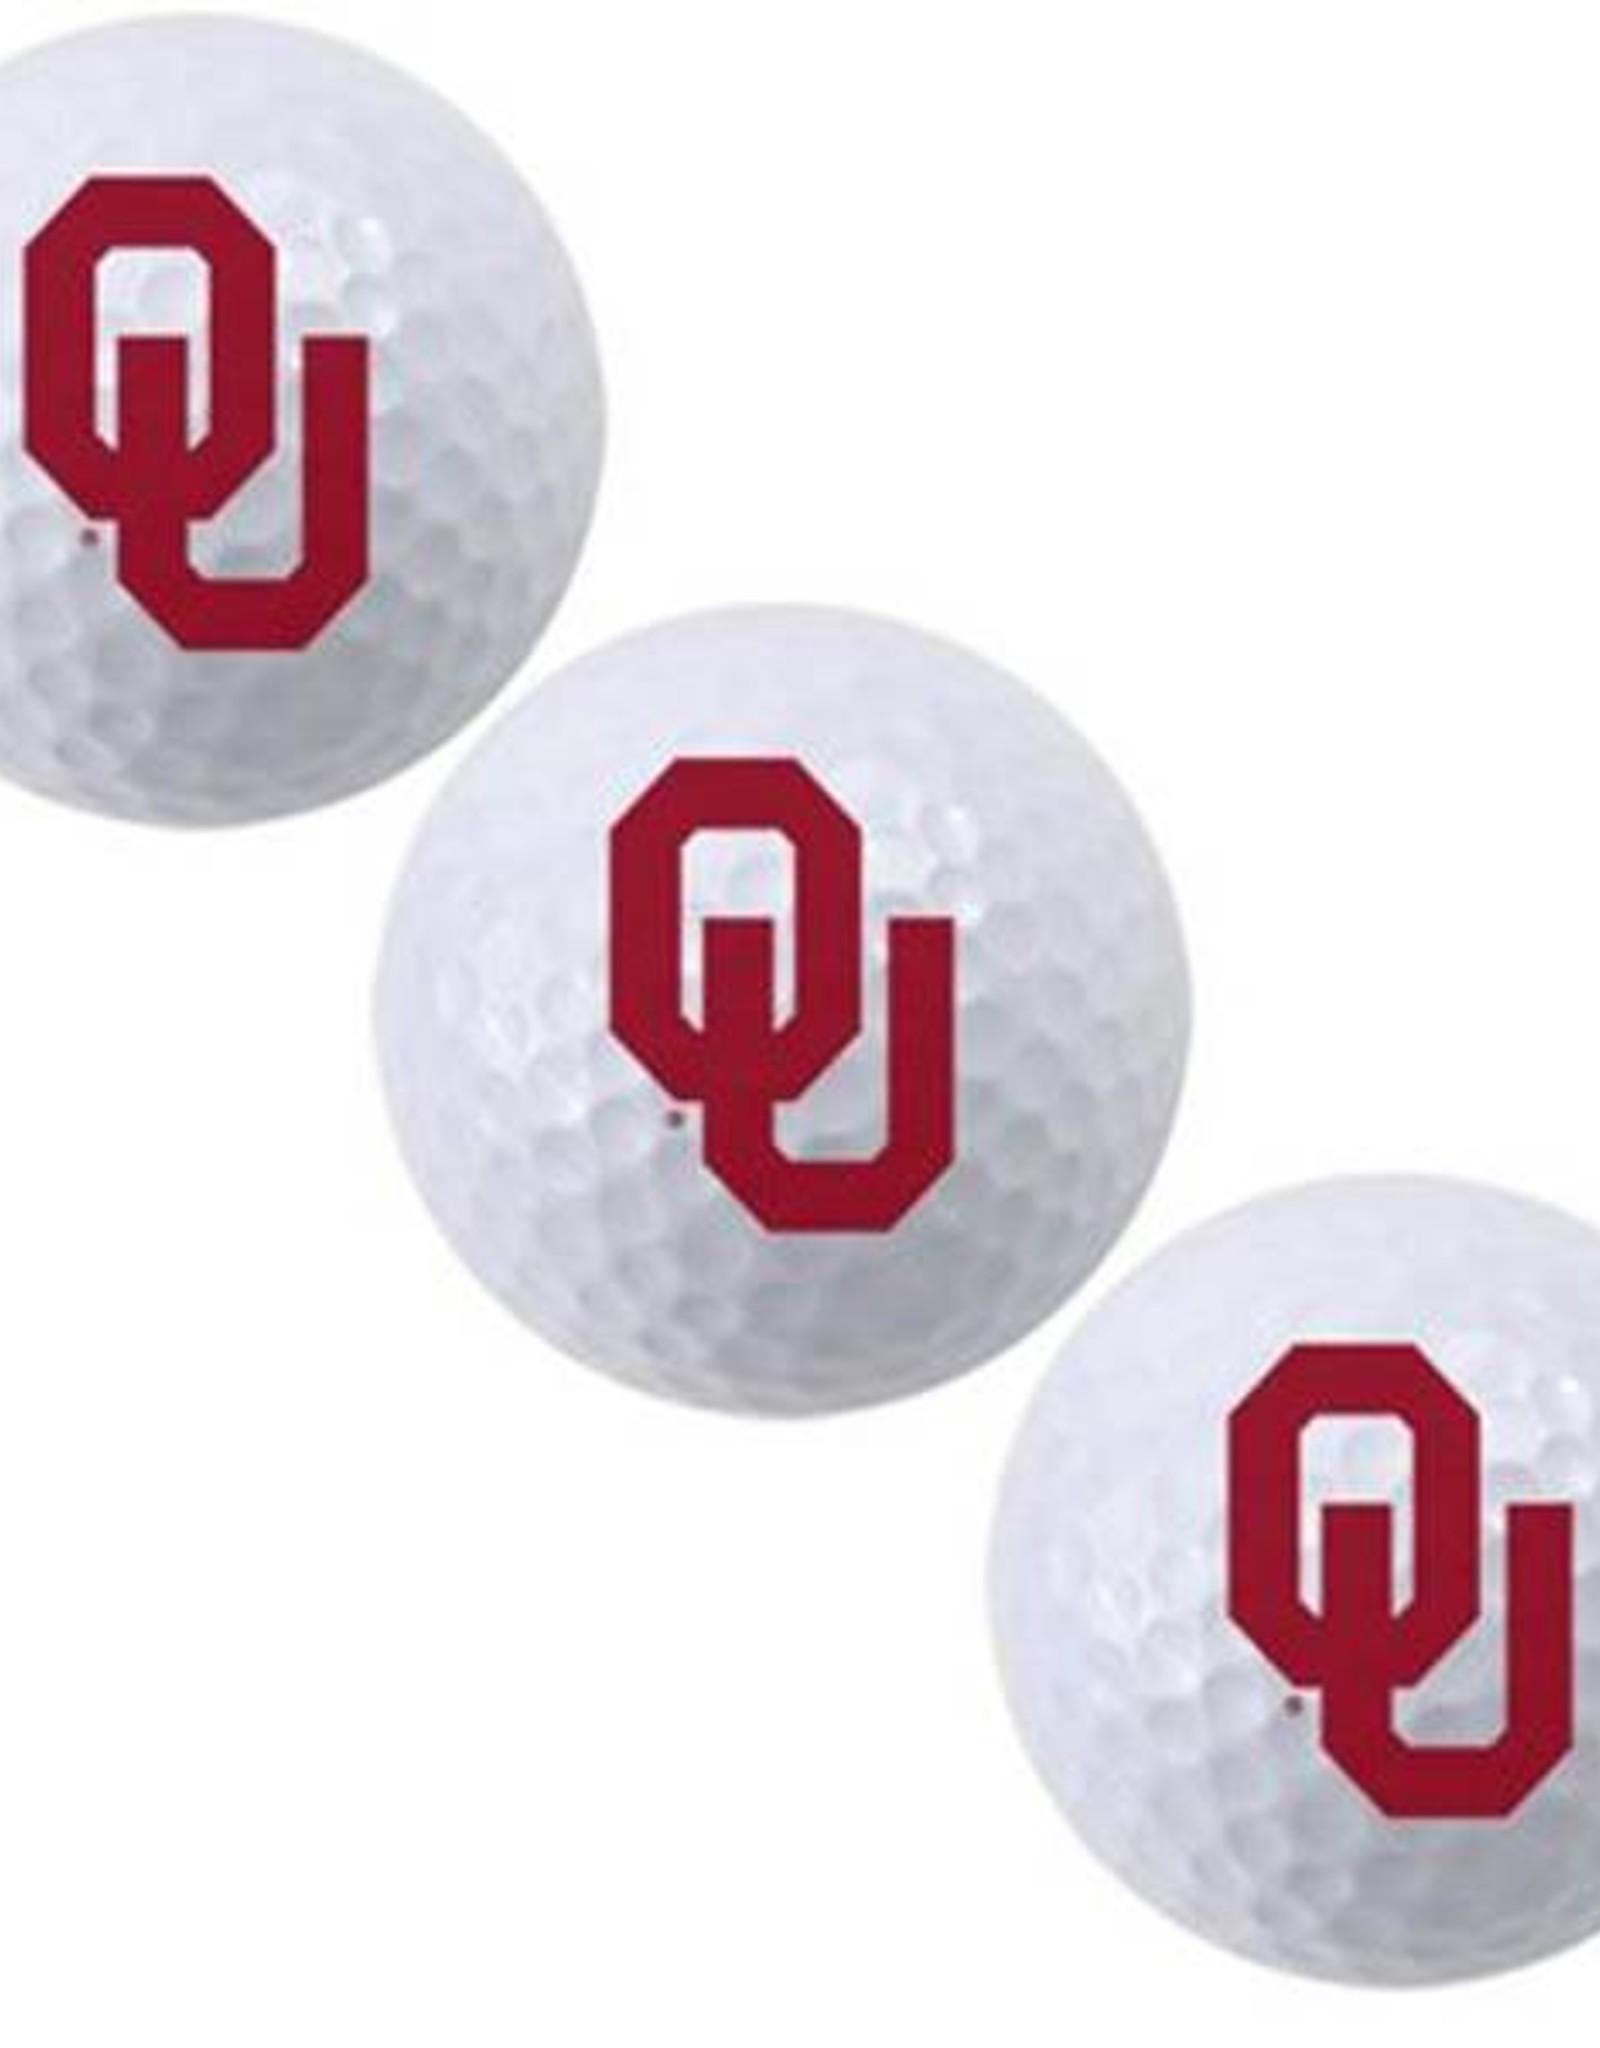 Team Effort OU 3 Pack Golf Balls